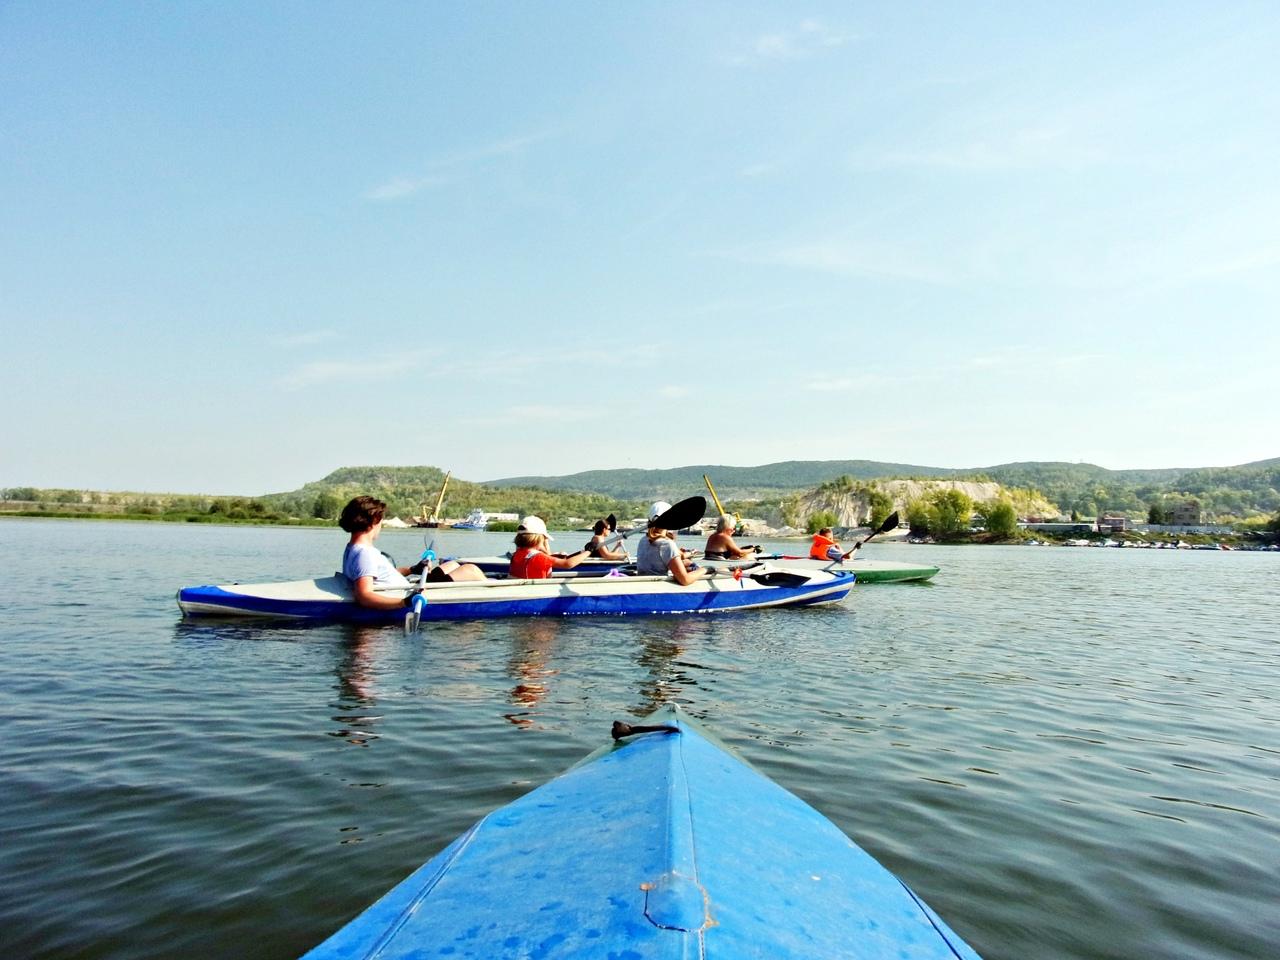 Афиша Самара Сплав на байдарках по реке Сок, 10 мая